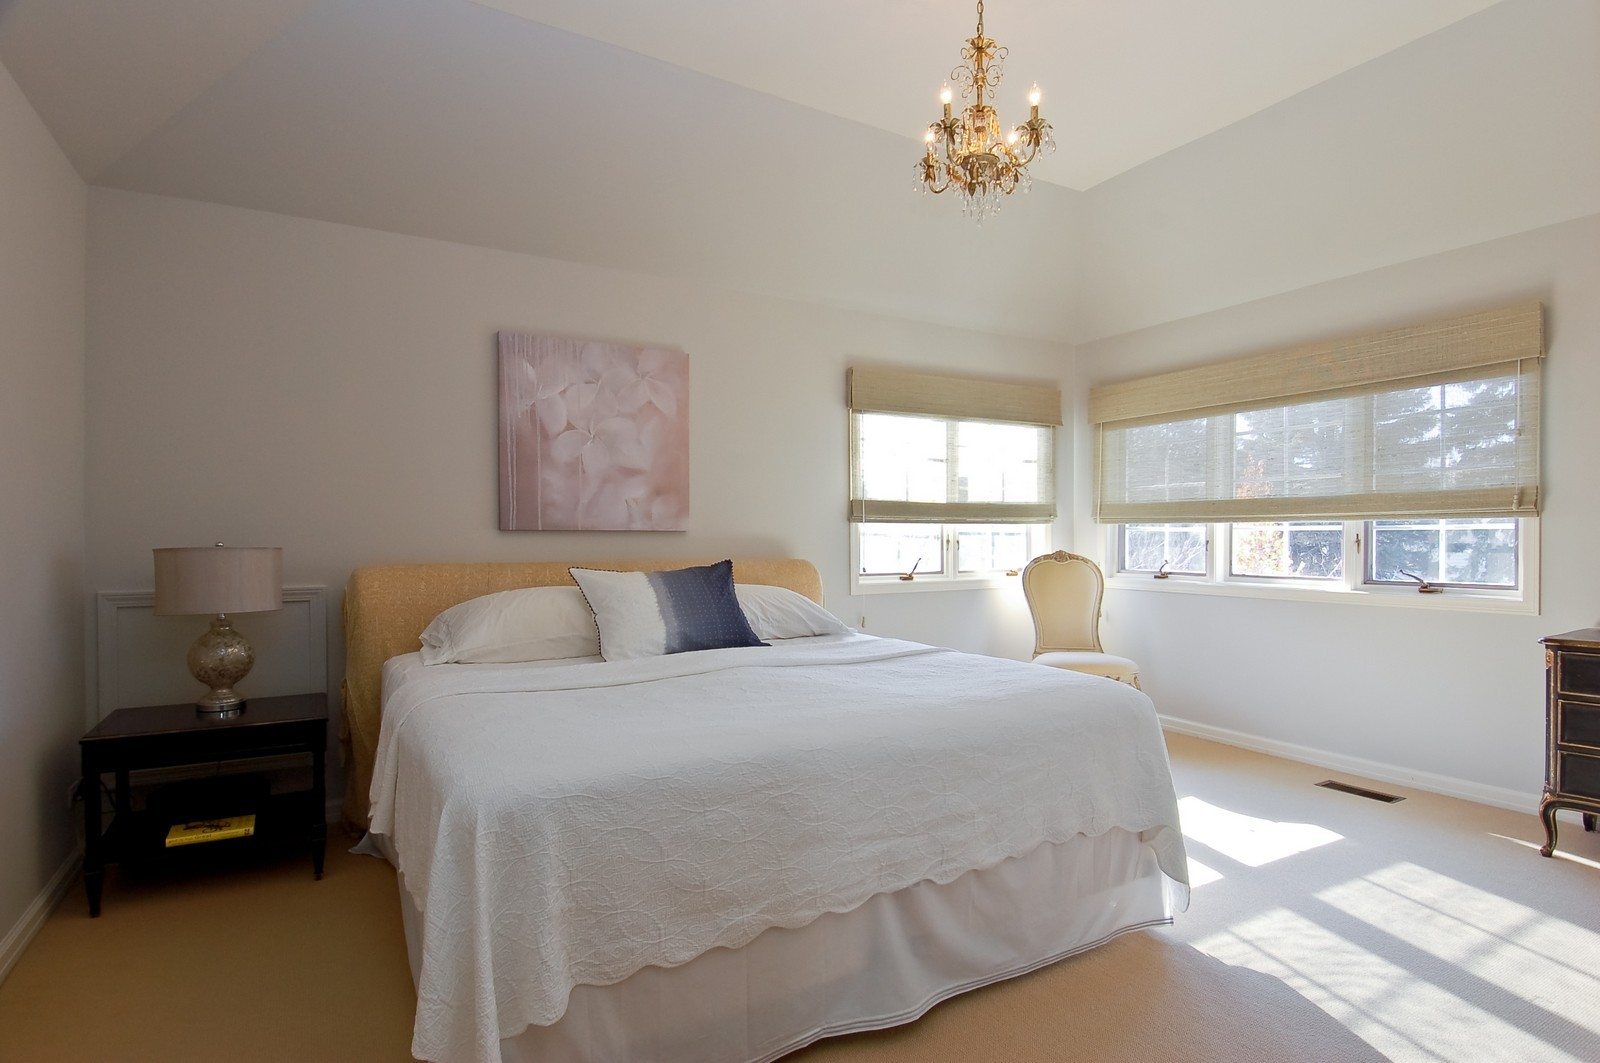 Real Estate Photography - 1492 Lloyd, Wheaton, IL, 60189 - Master Bedroom